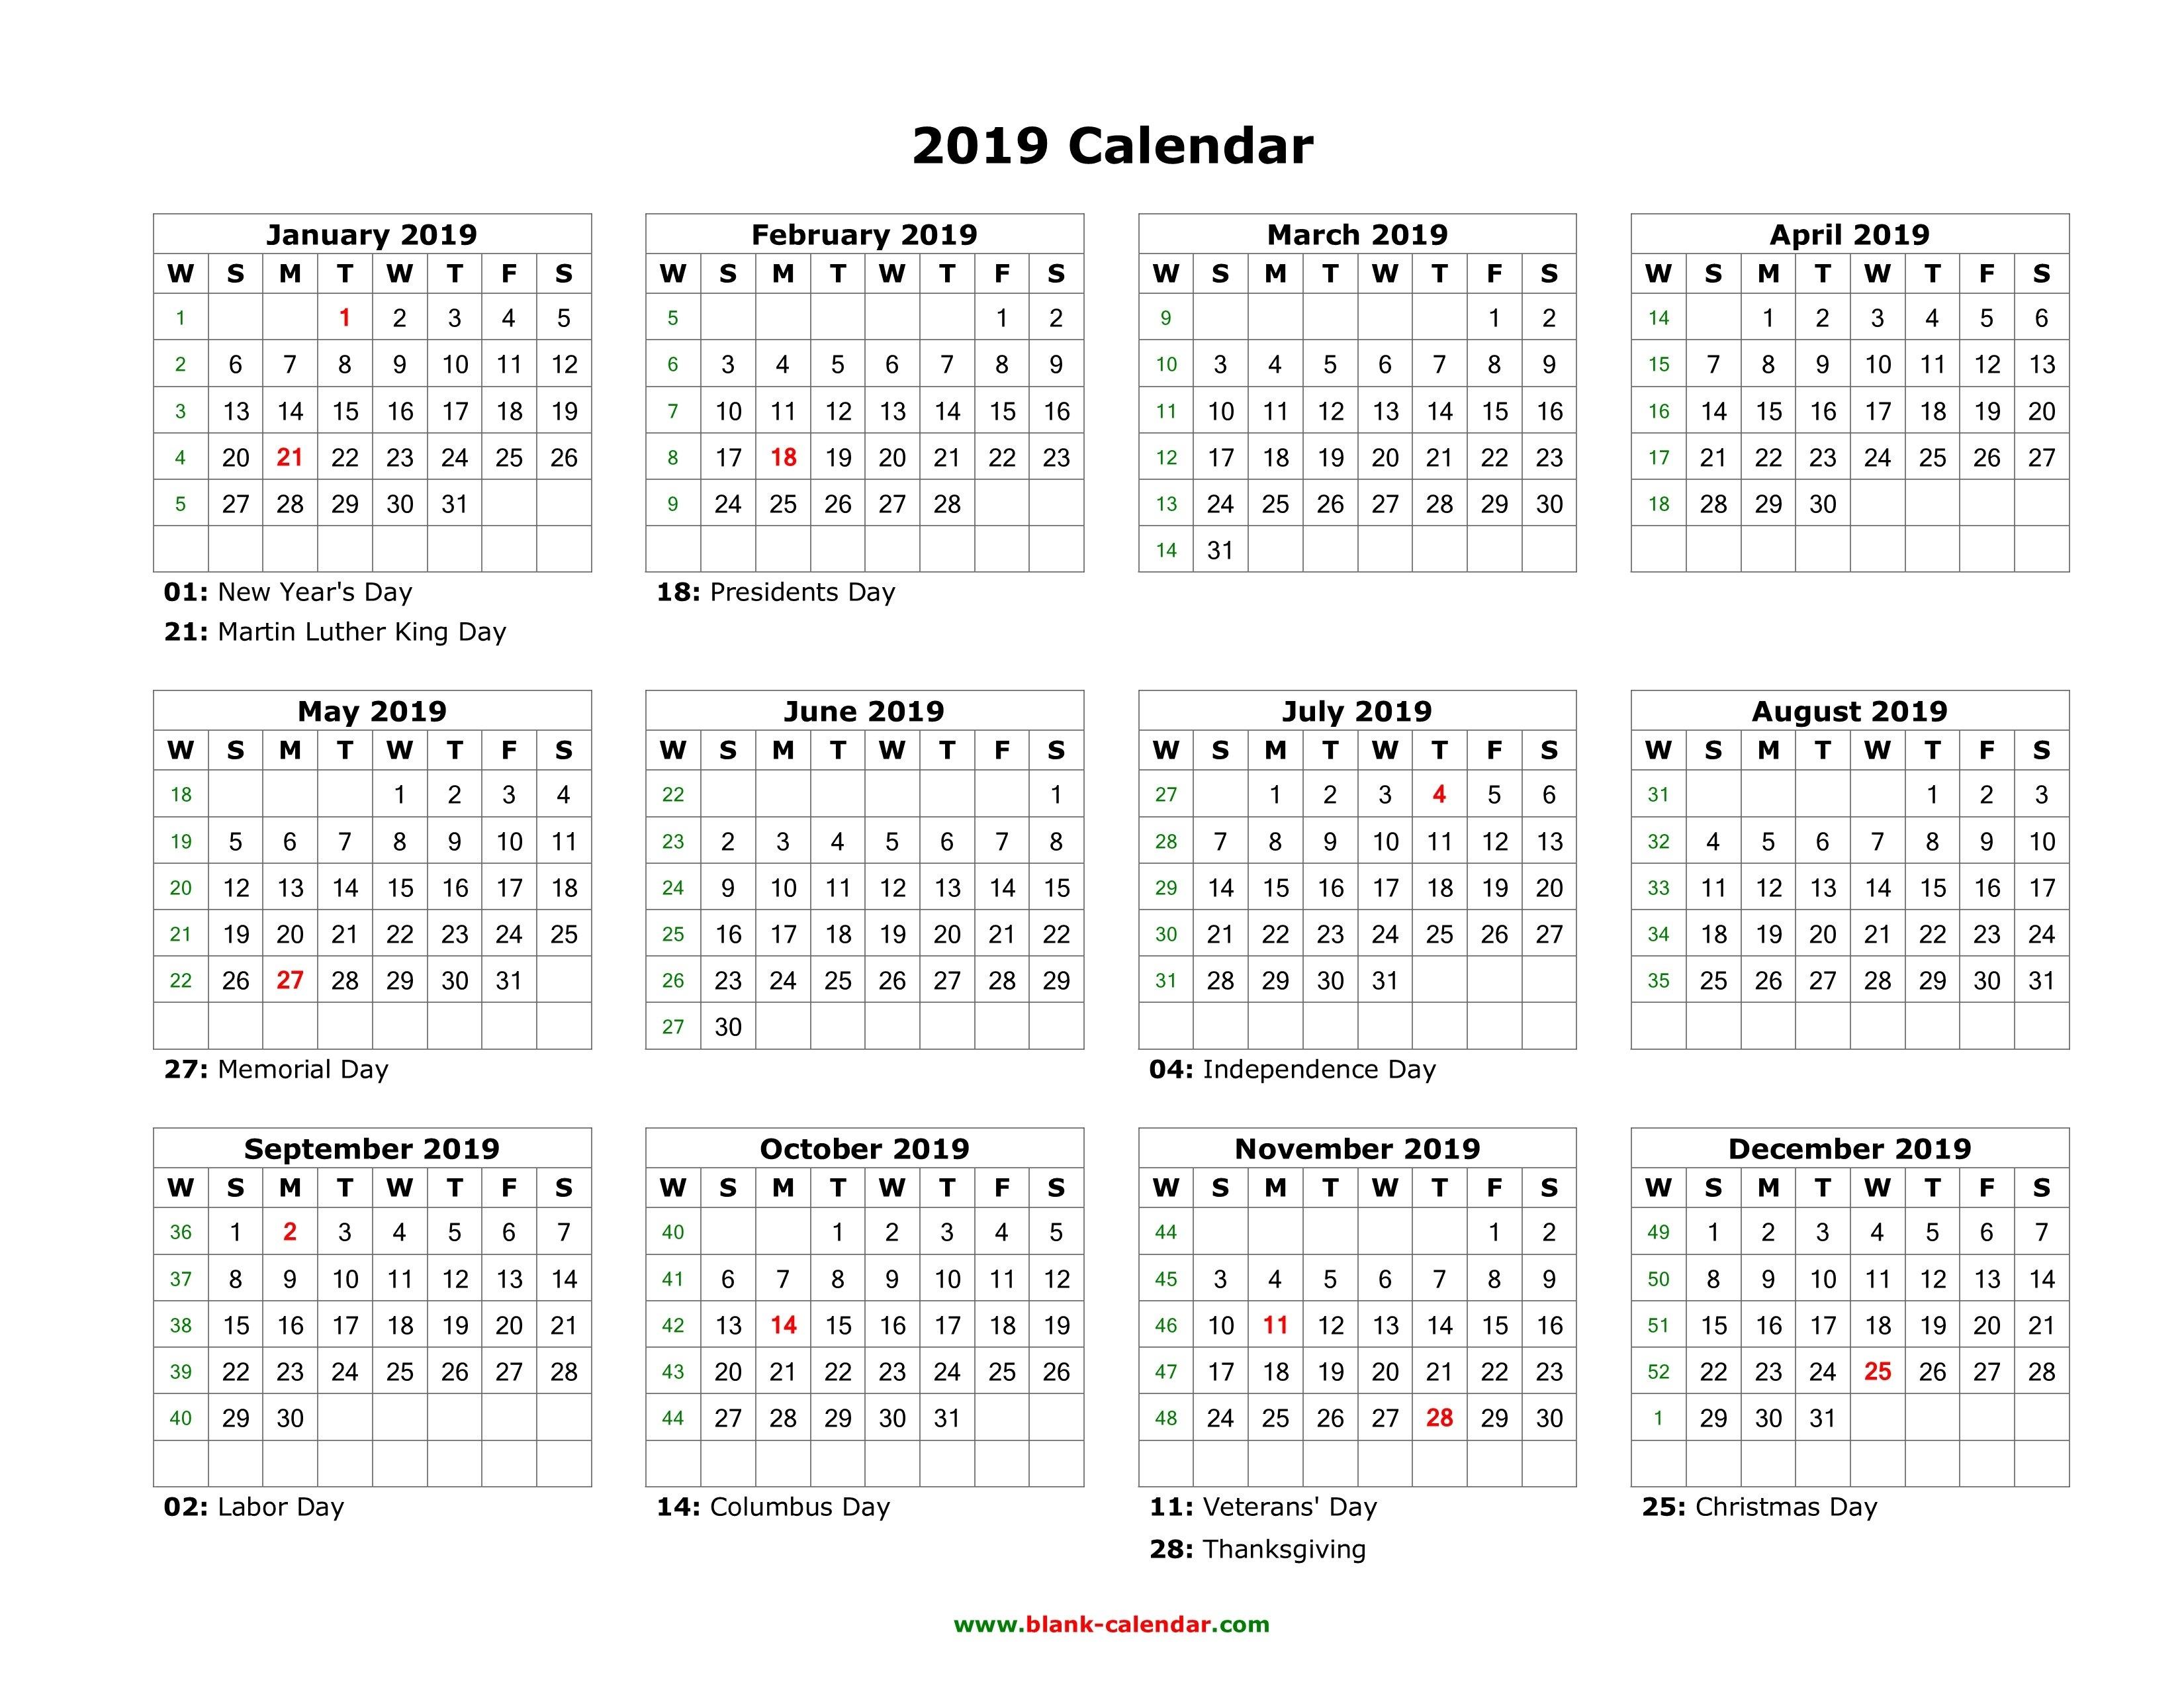 Blank Calendar 2019 | Free Download Calendar Templates Calendar 2019 Limba Romana